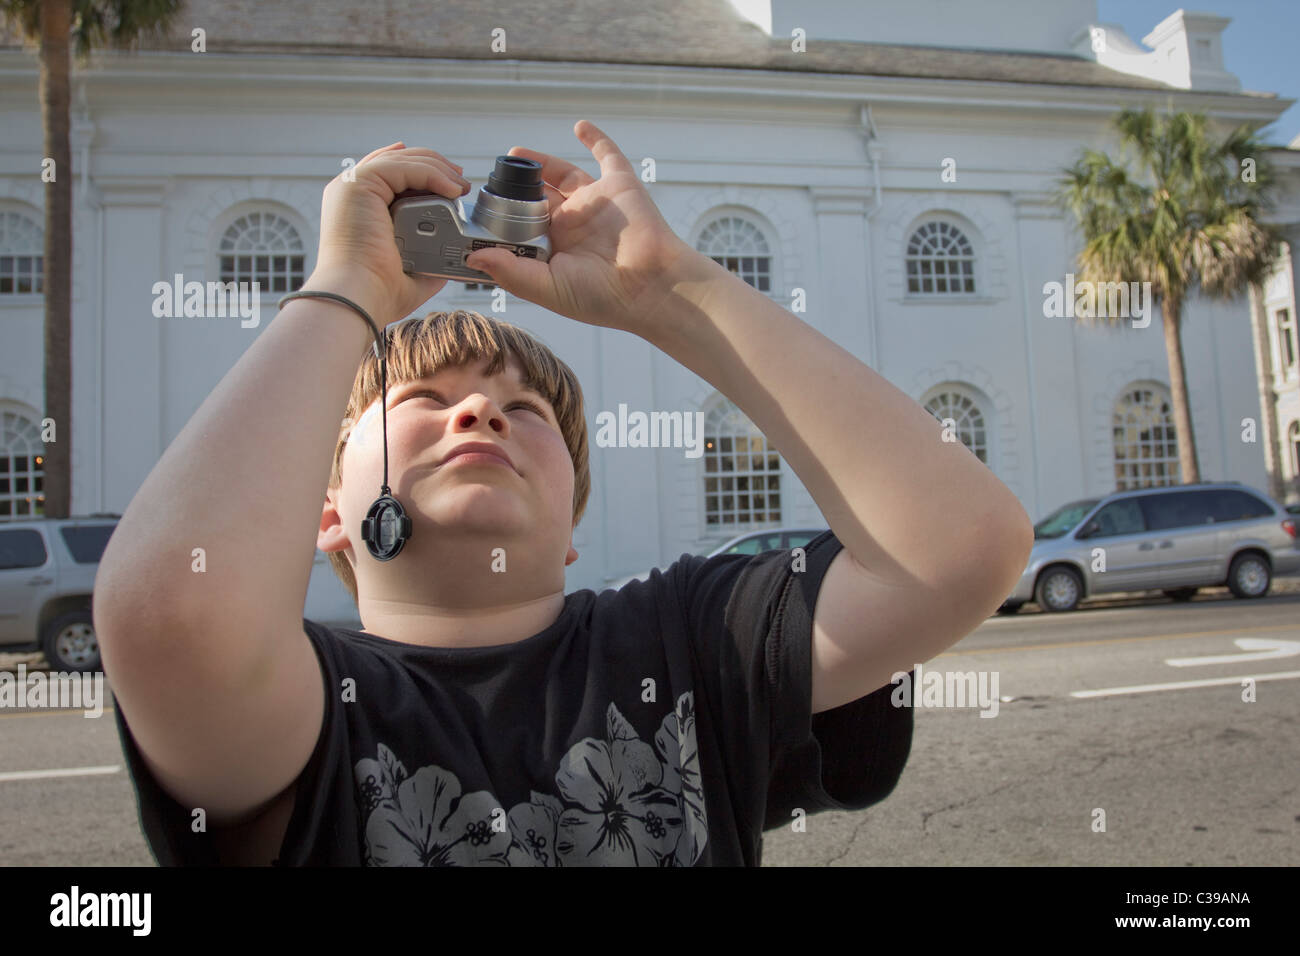 young boy using digital camera to take photos - Stock Image